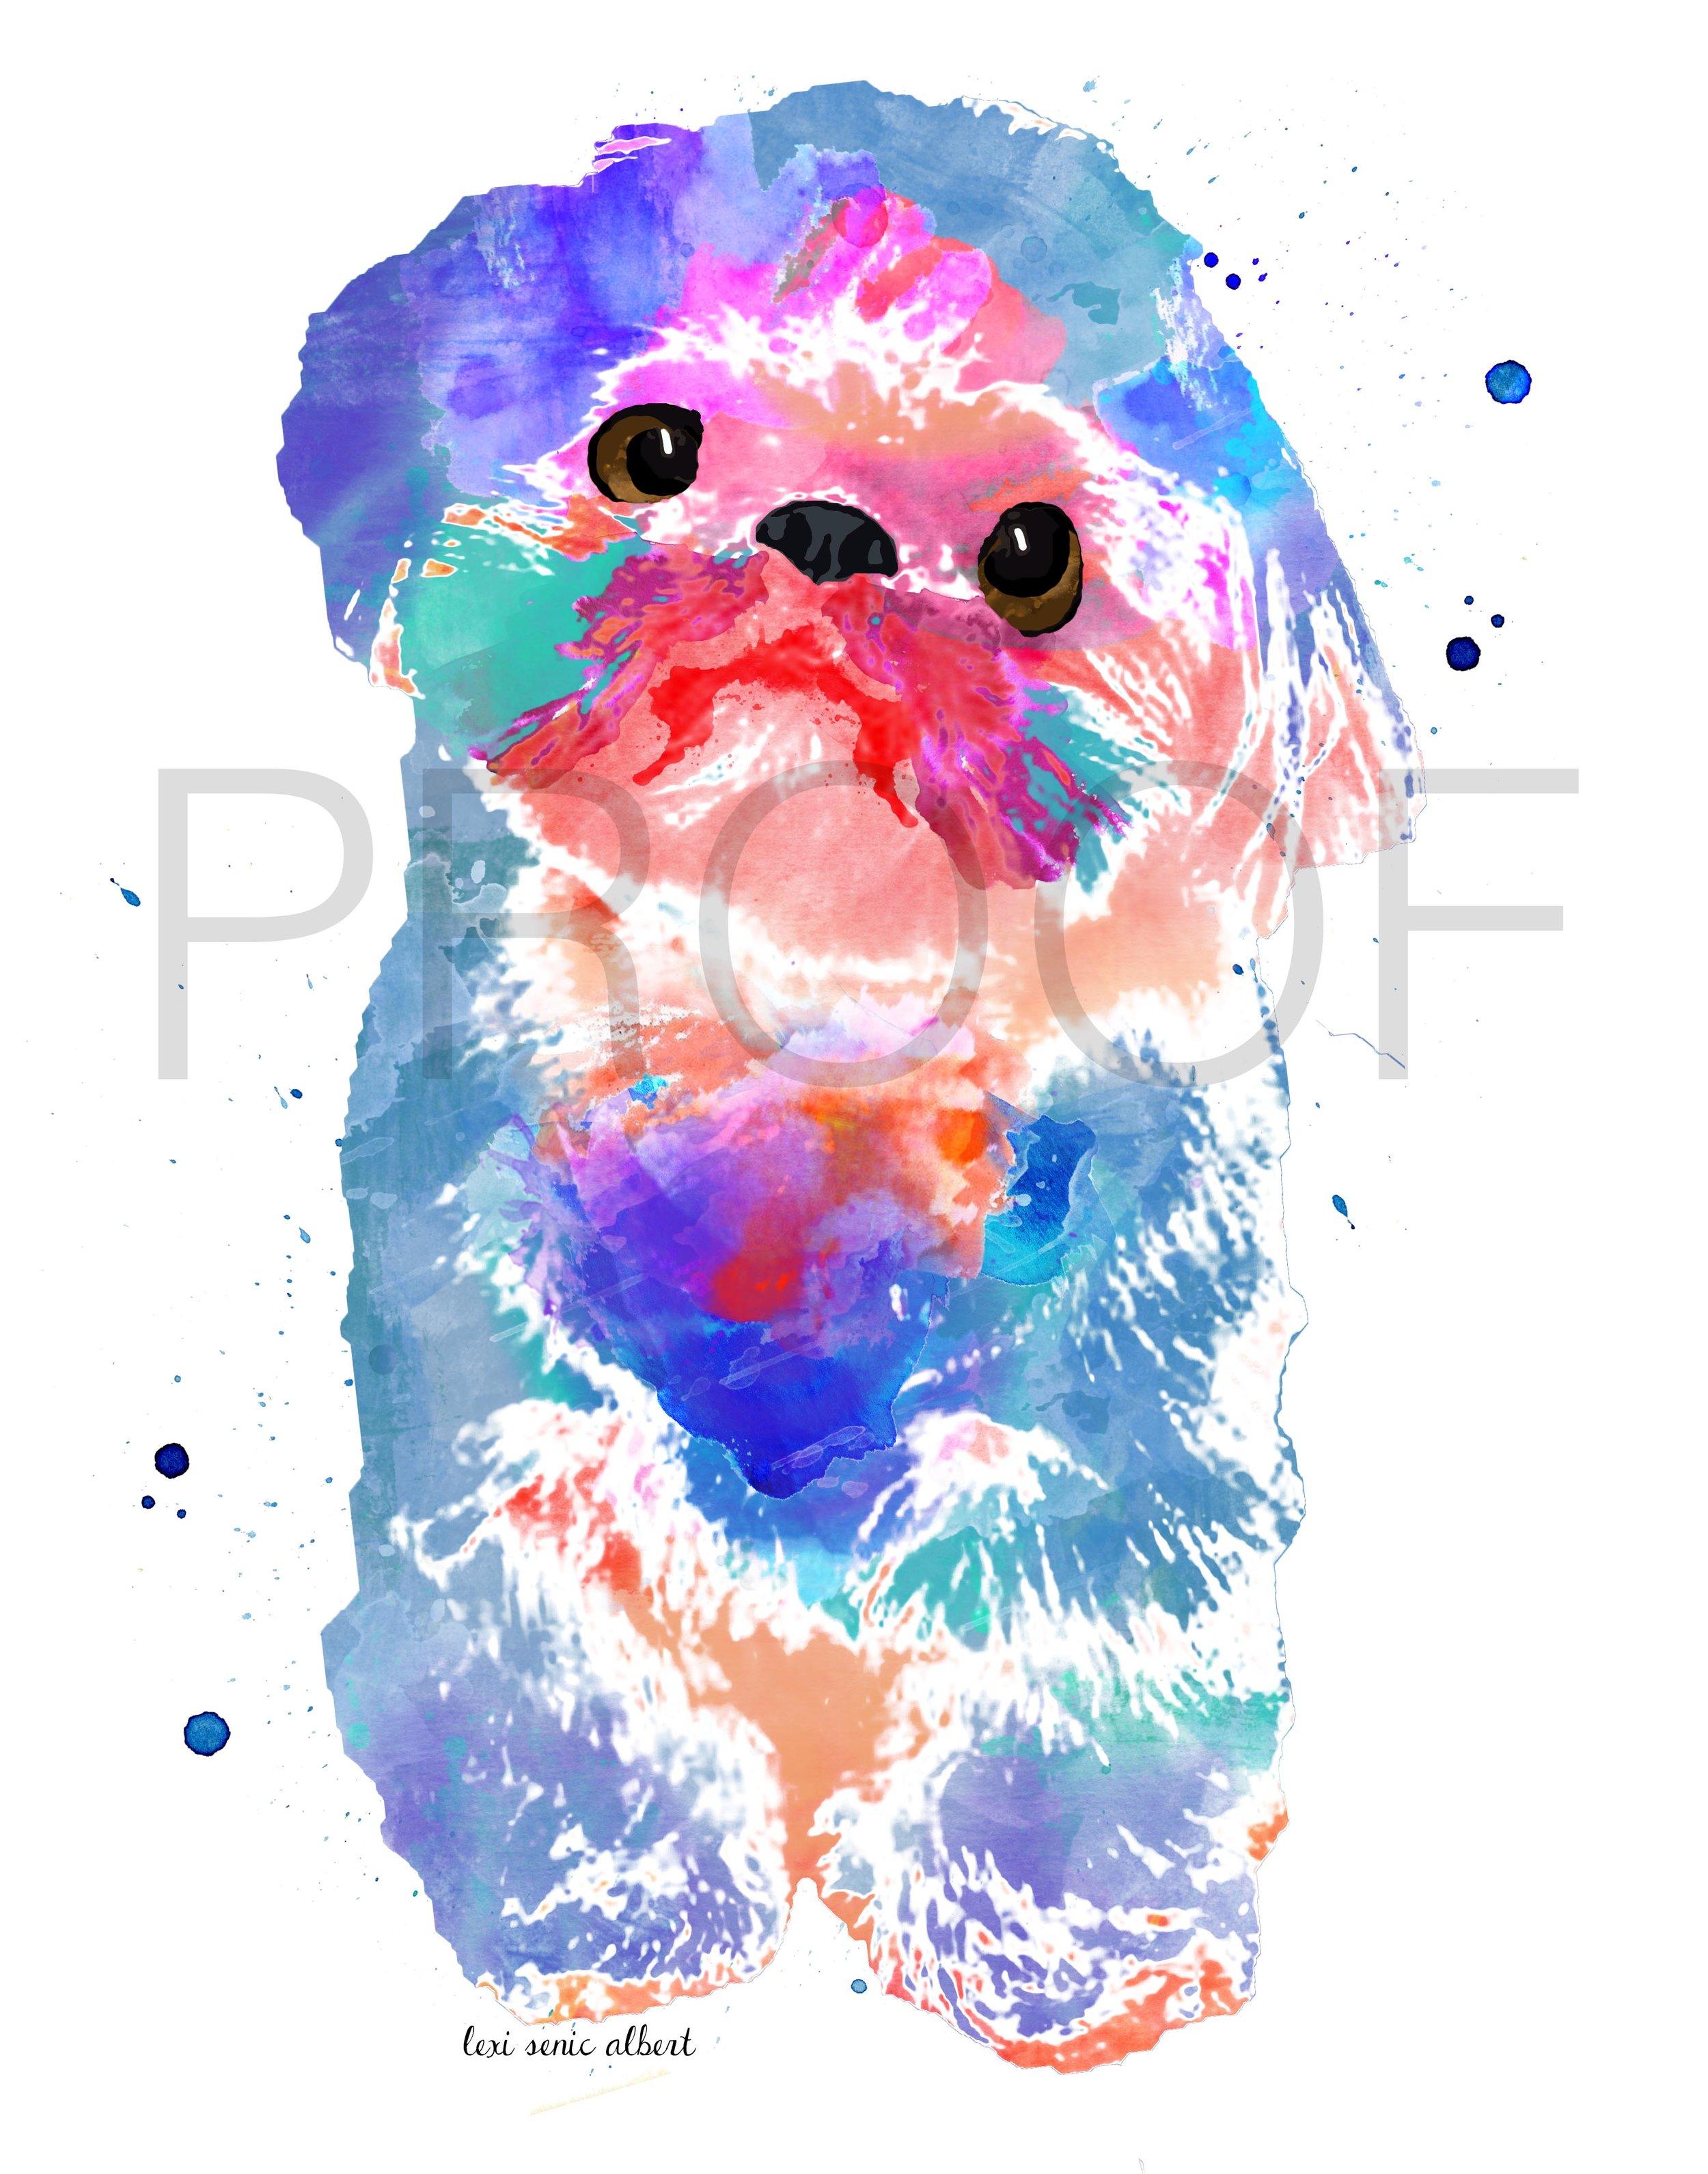 Shih Tzu Watercolor Dog Portrait Popcorn Free In The Lines